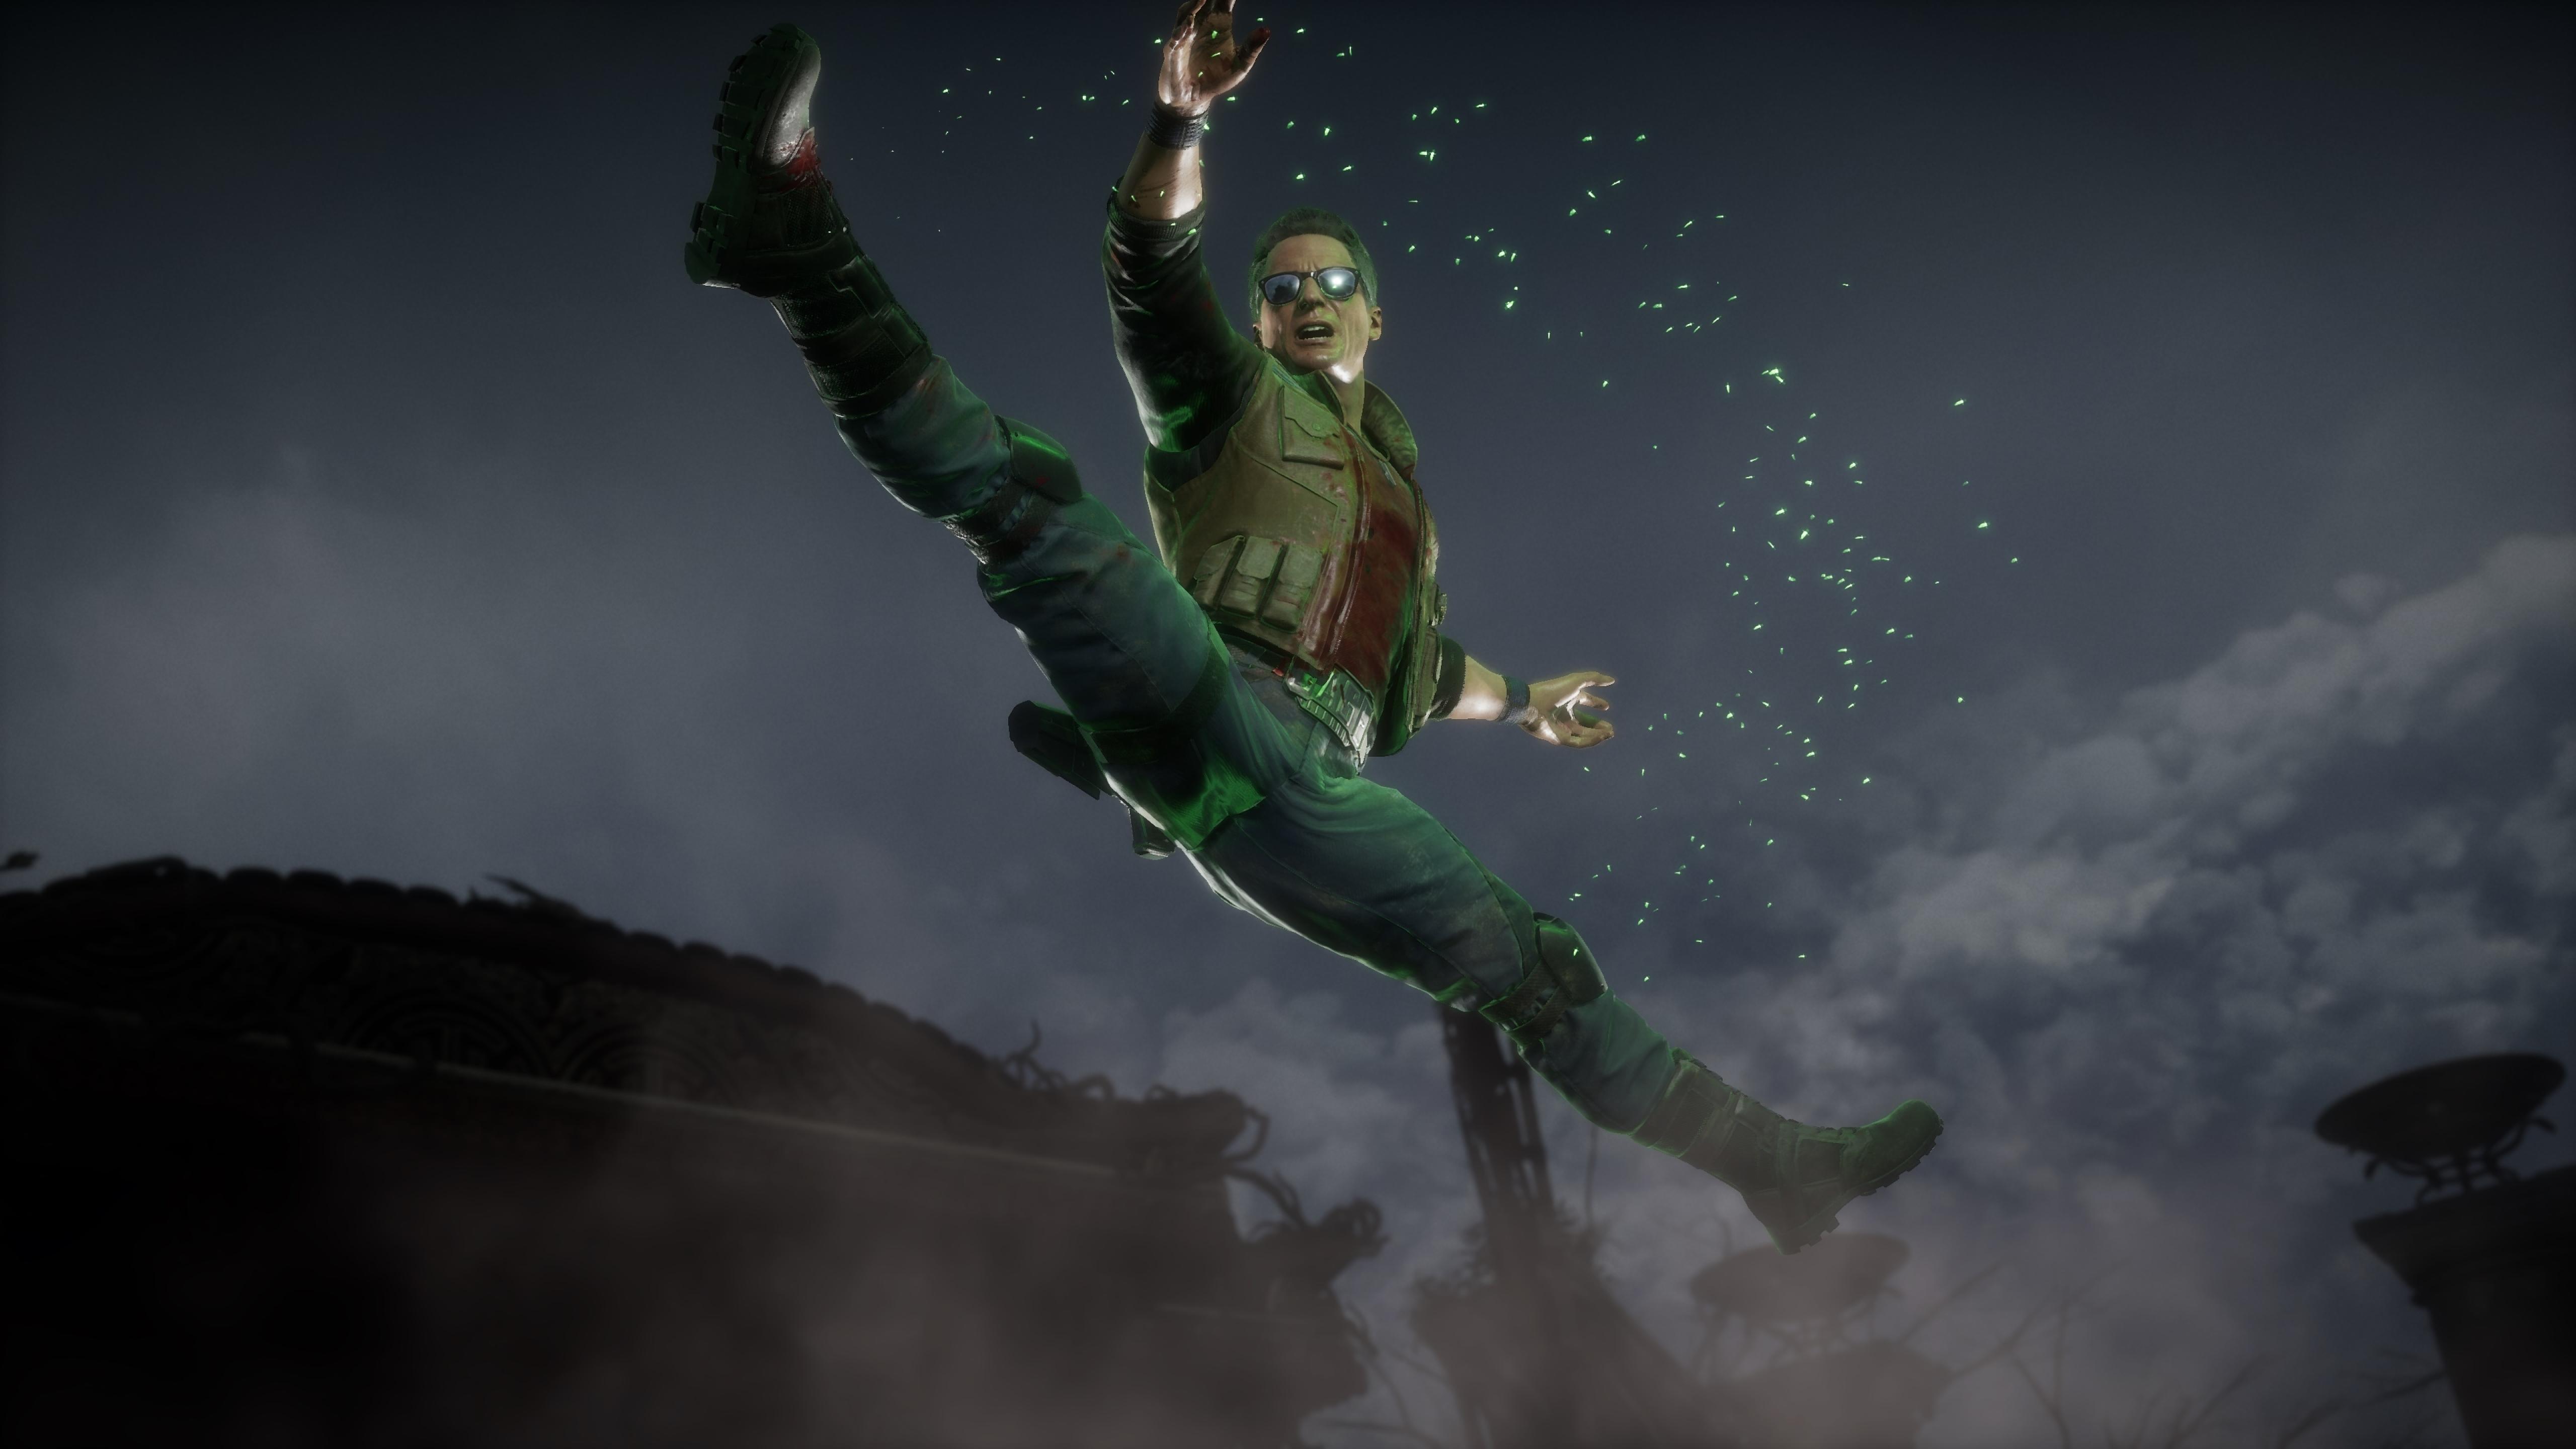 5120x2880 Johnny Cage Mortal Kombat 11 5K Wallpaper, HD